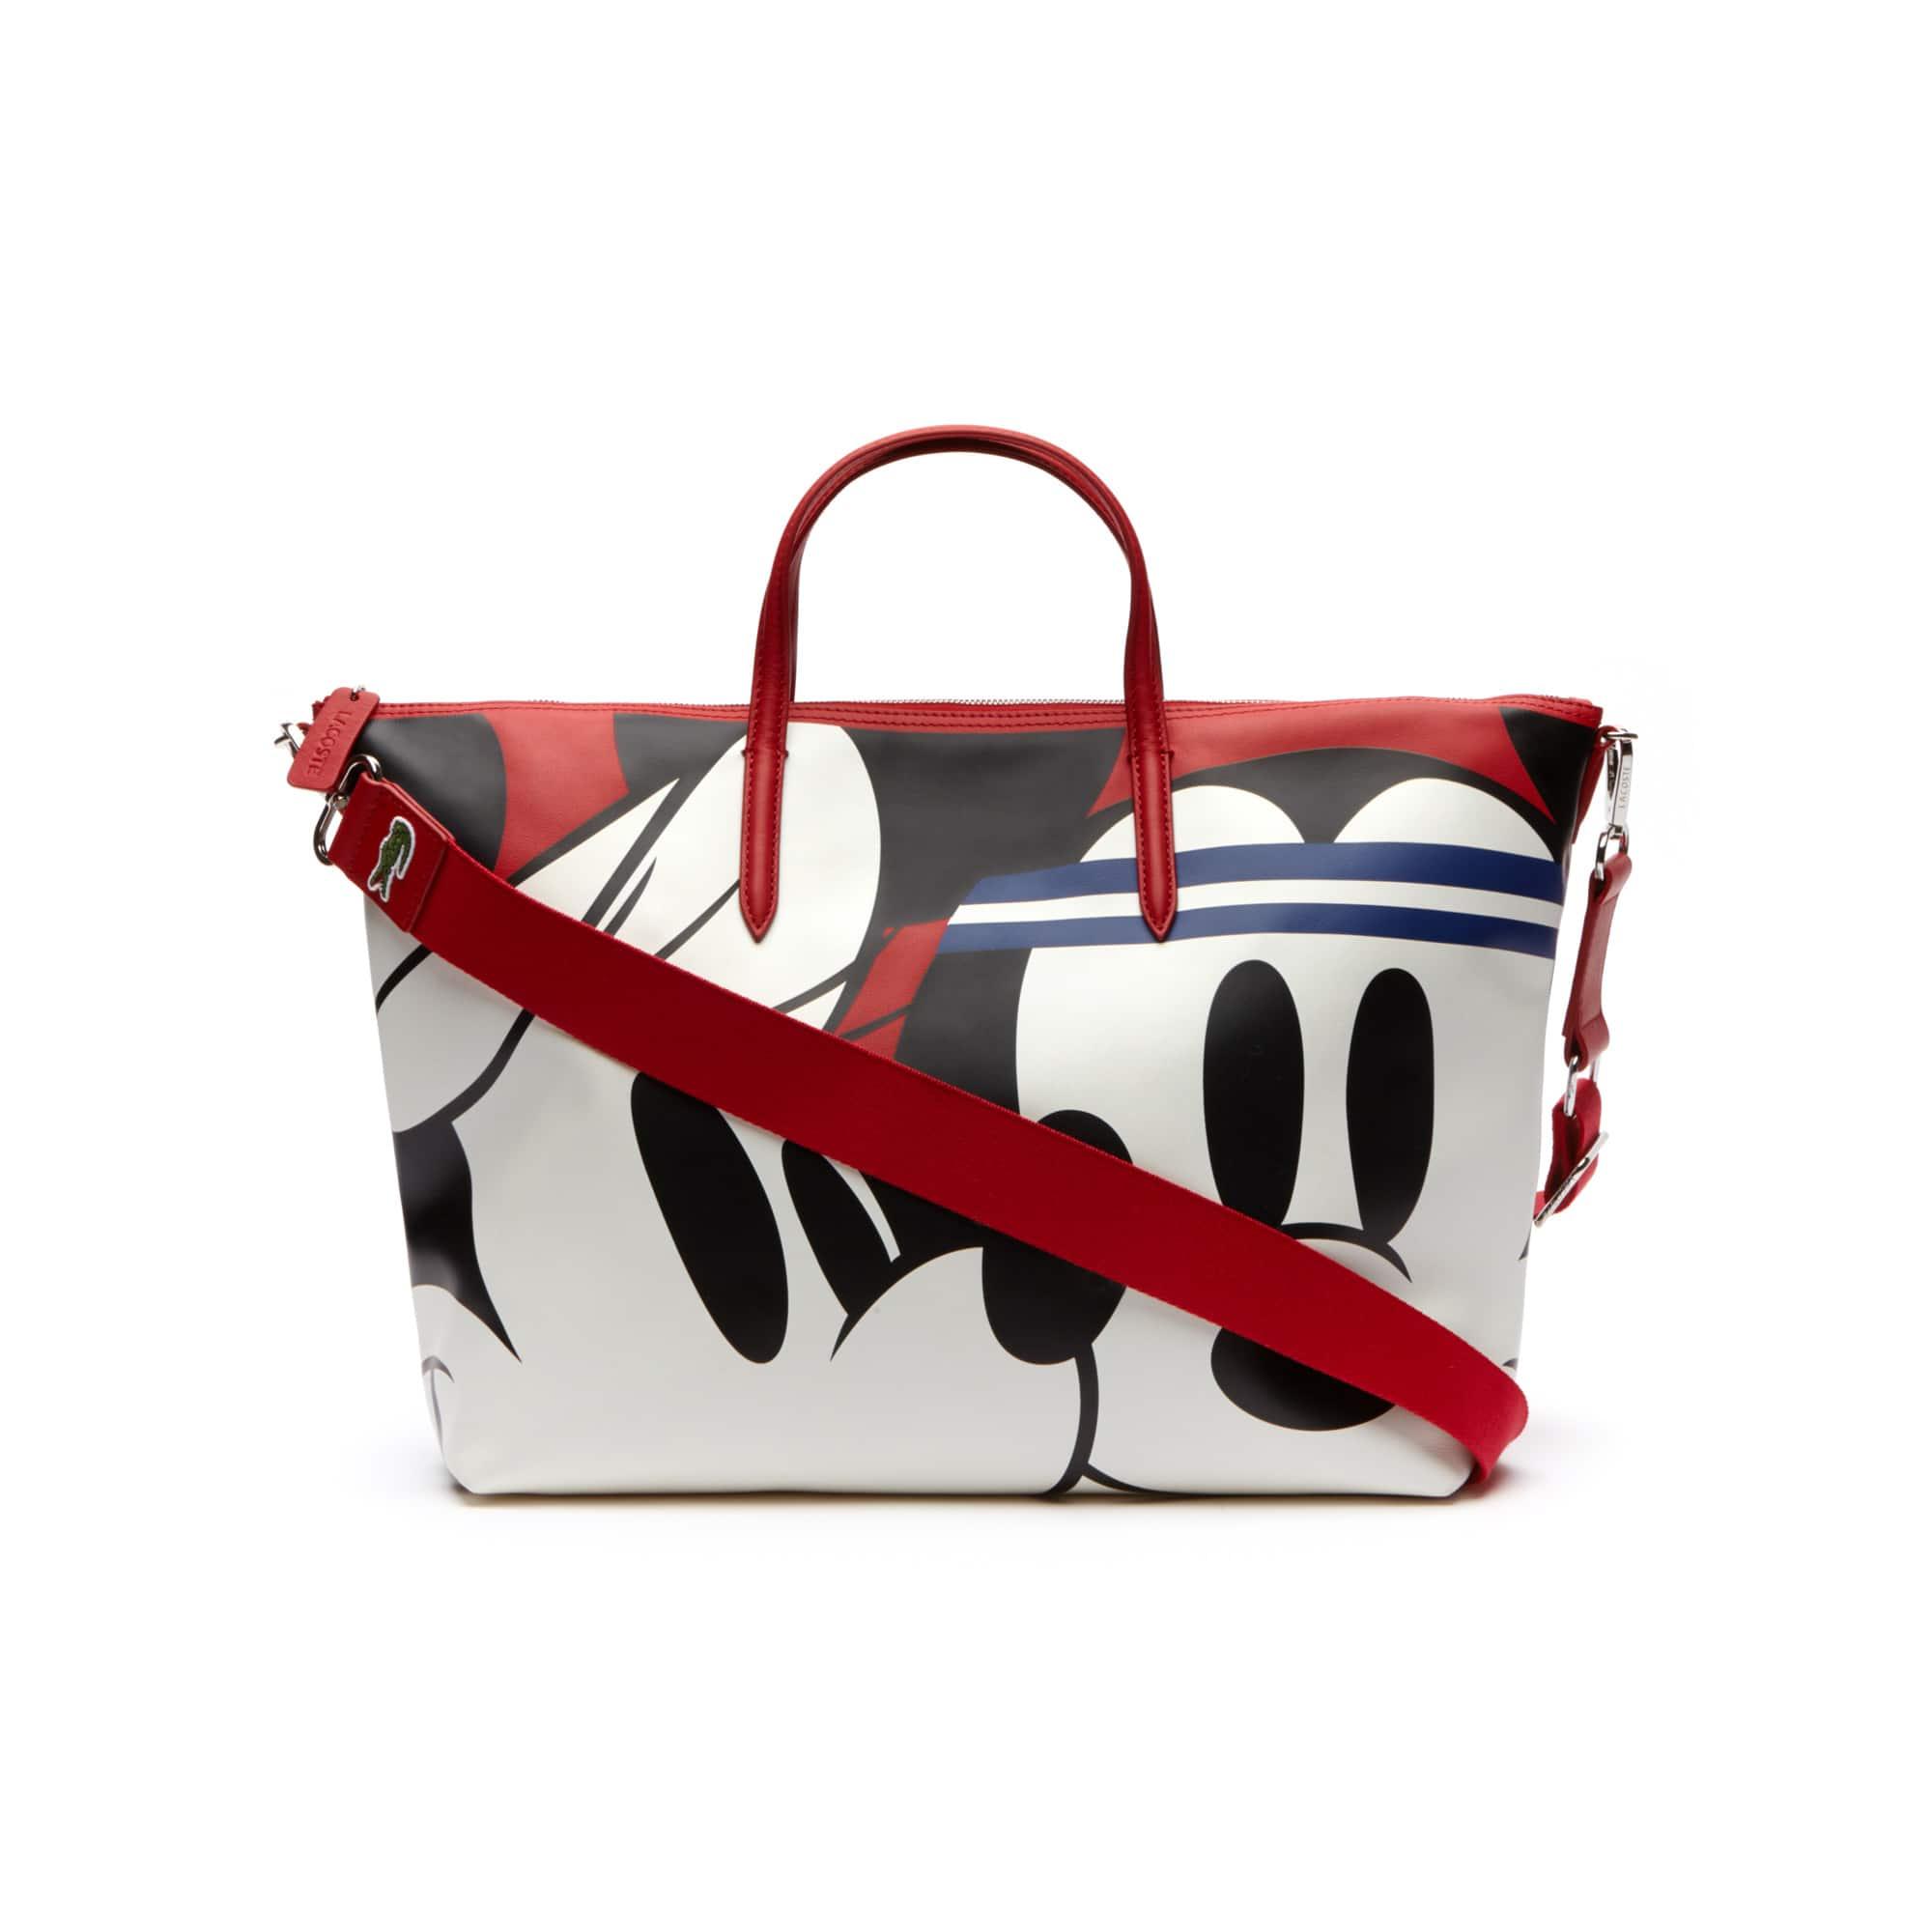 Damen DISNEY HOLIDAY COLLECTOR Tote Bag mit Print